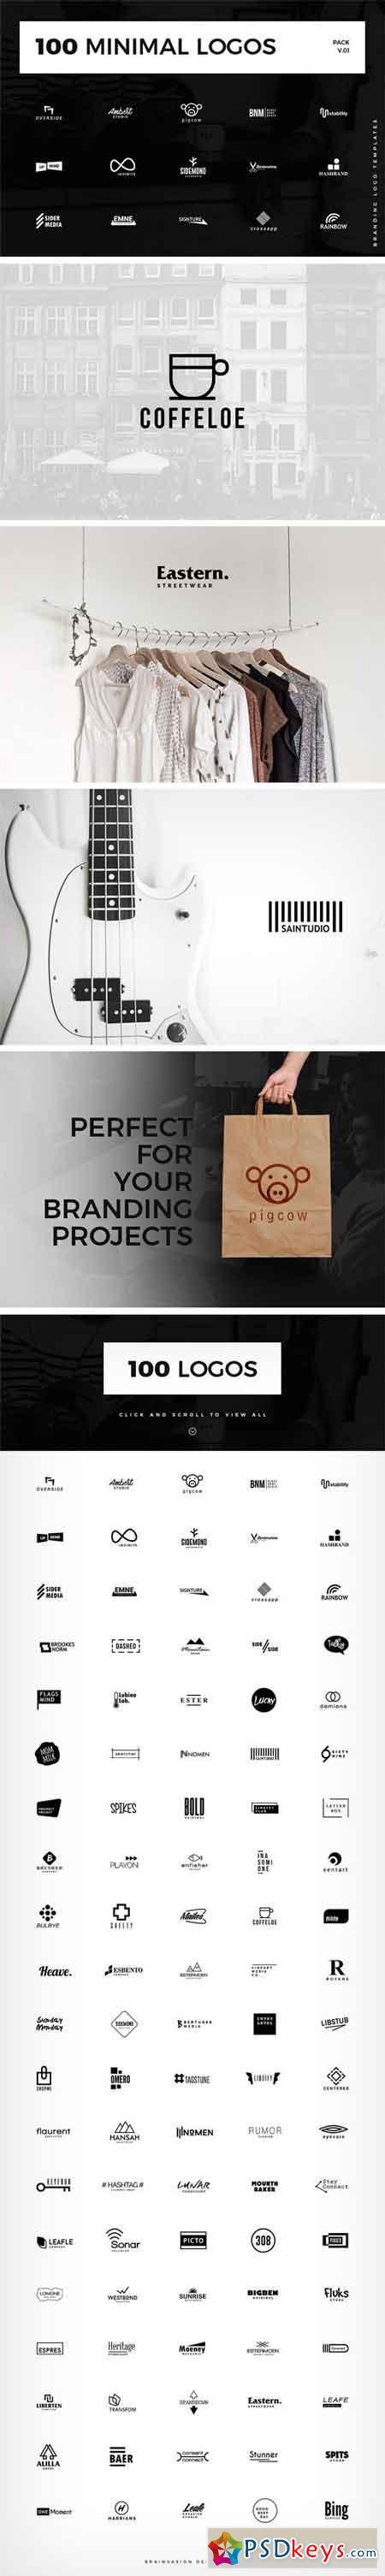 100 Minimal Logo Templates 1583827 » Free Download Photoshop